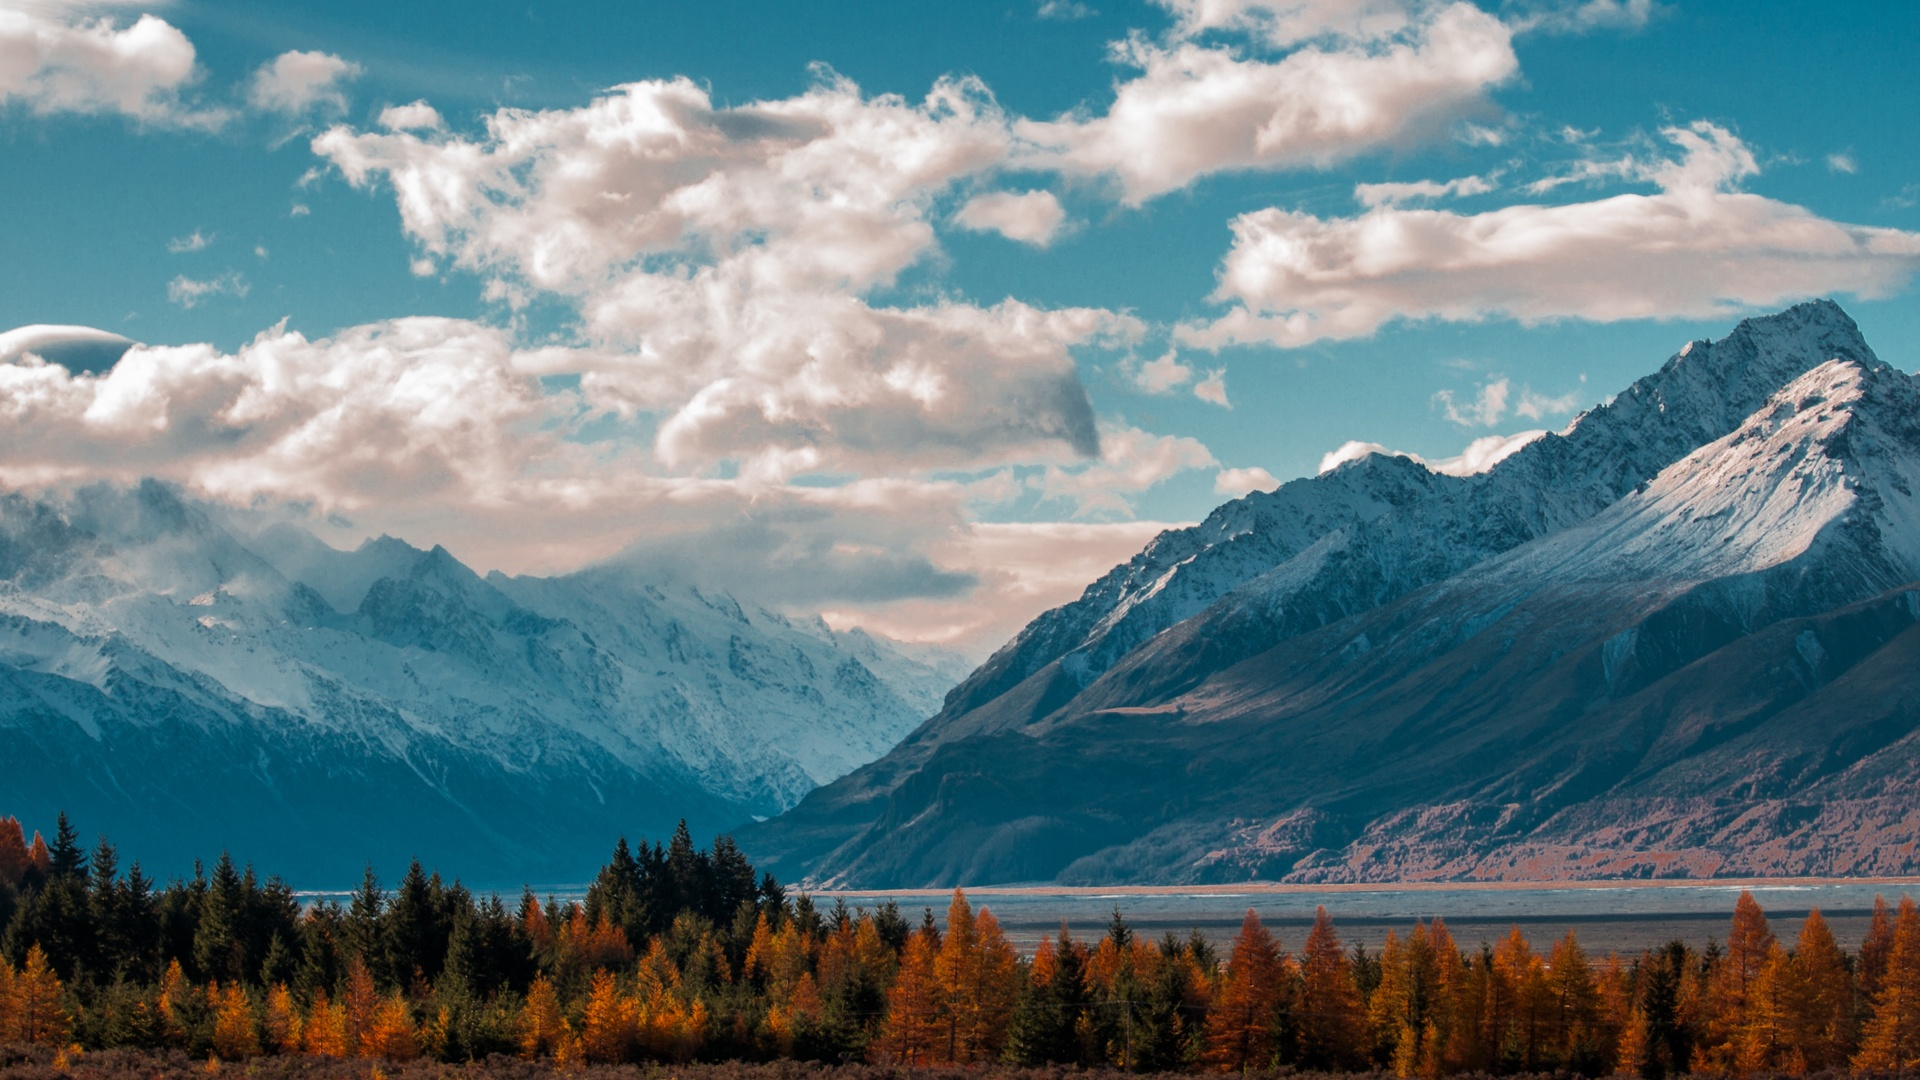 1920x1080 Mountains Landscape Laptop Full HD 1080P HD 4k ...